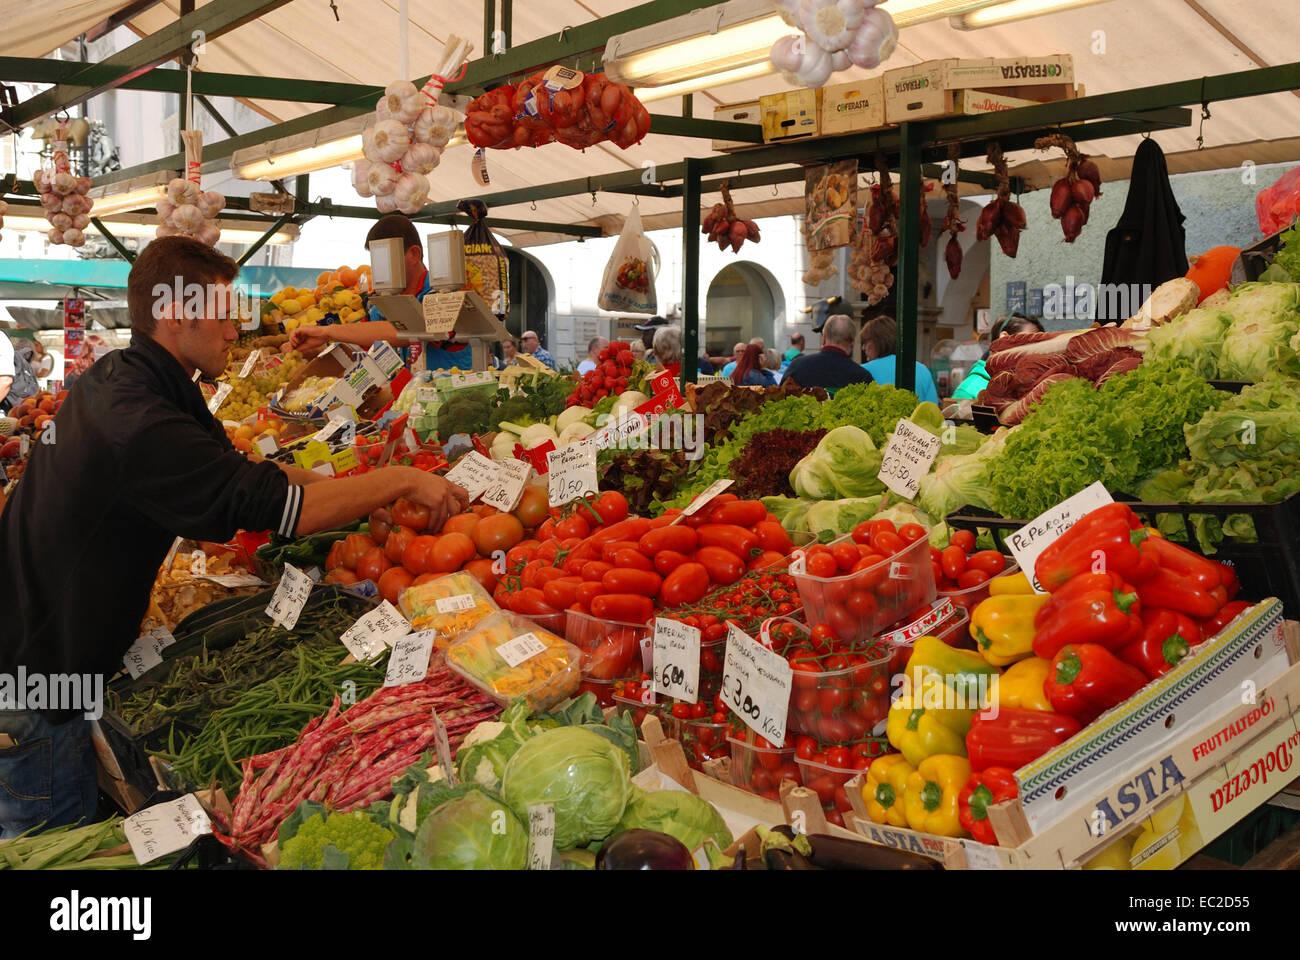 Fruit market of the Bolzano in South Tyrol. - Stock Image